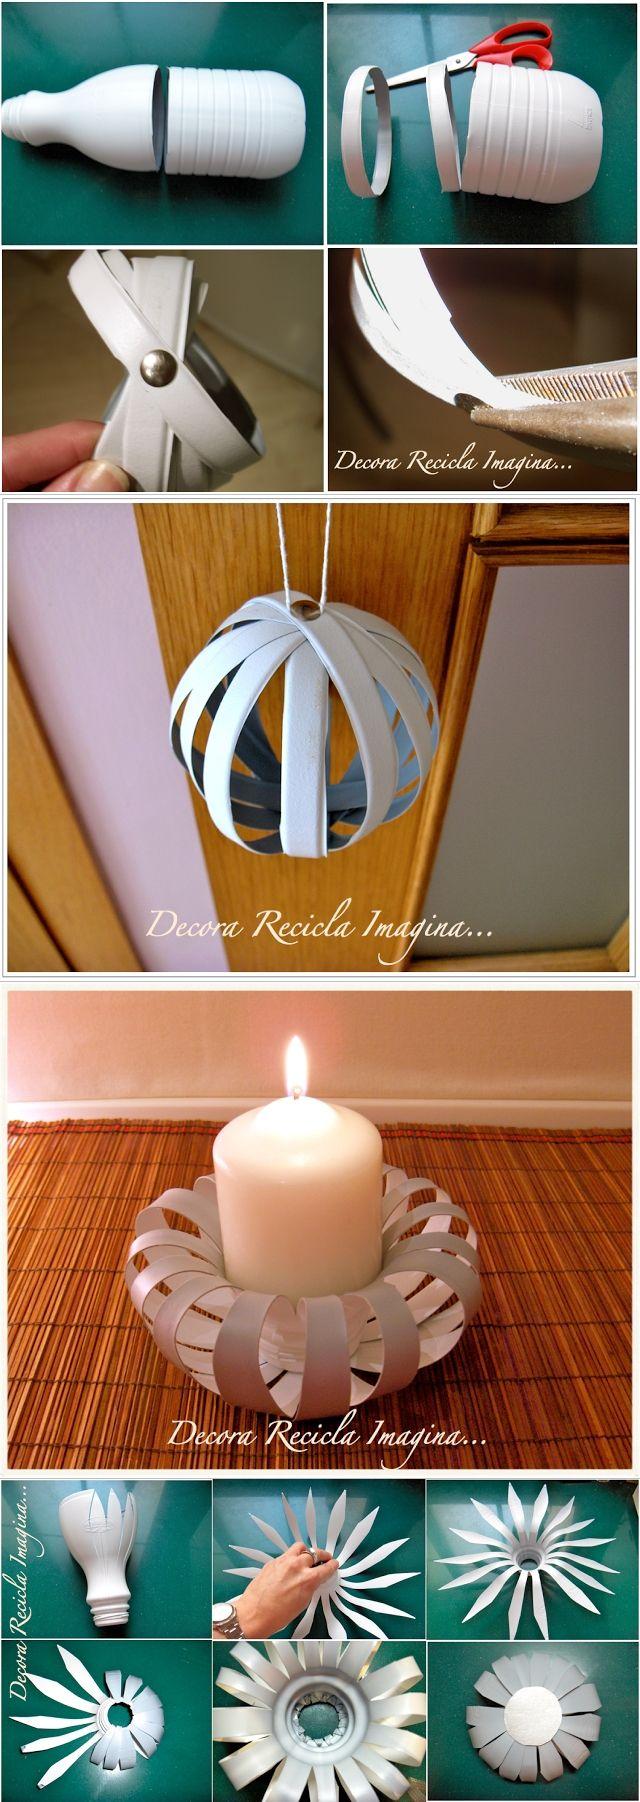 DIY Candle Holder from Plastic Bottle | www.FabArtDIY.com LIKE Us on Facebook == https://www.facebook.com/FabArtDIY